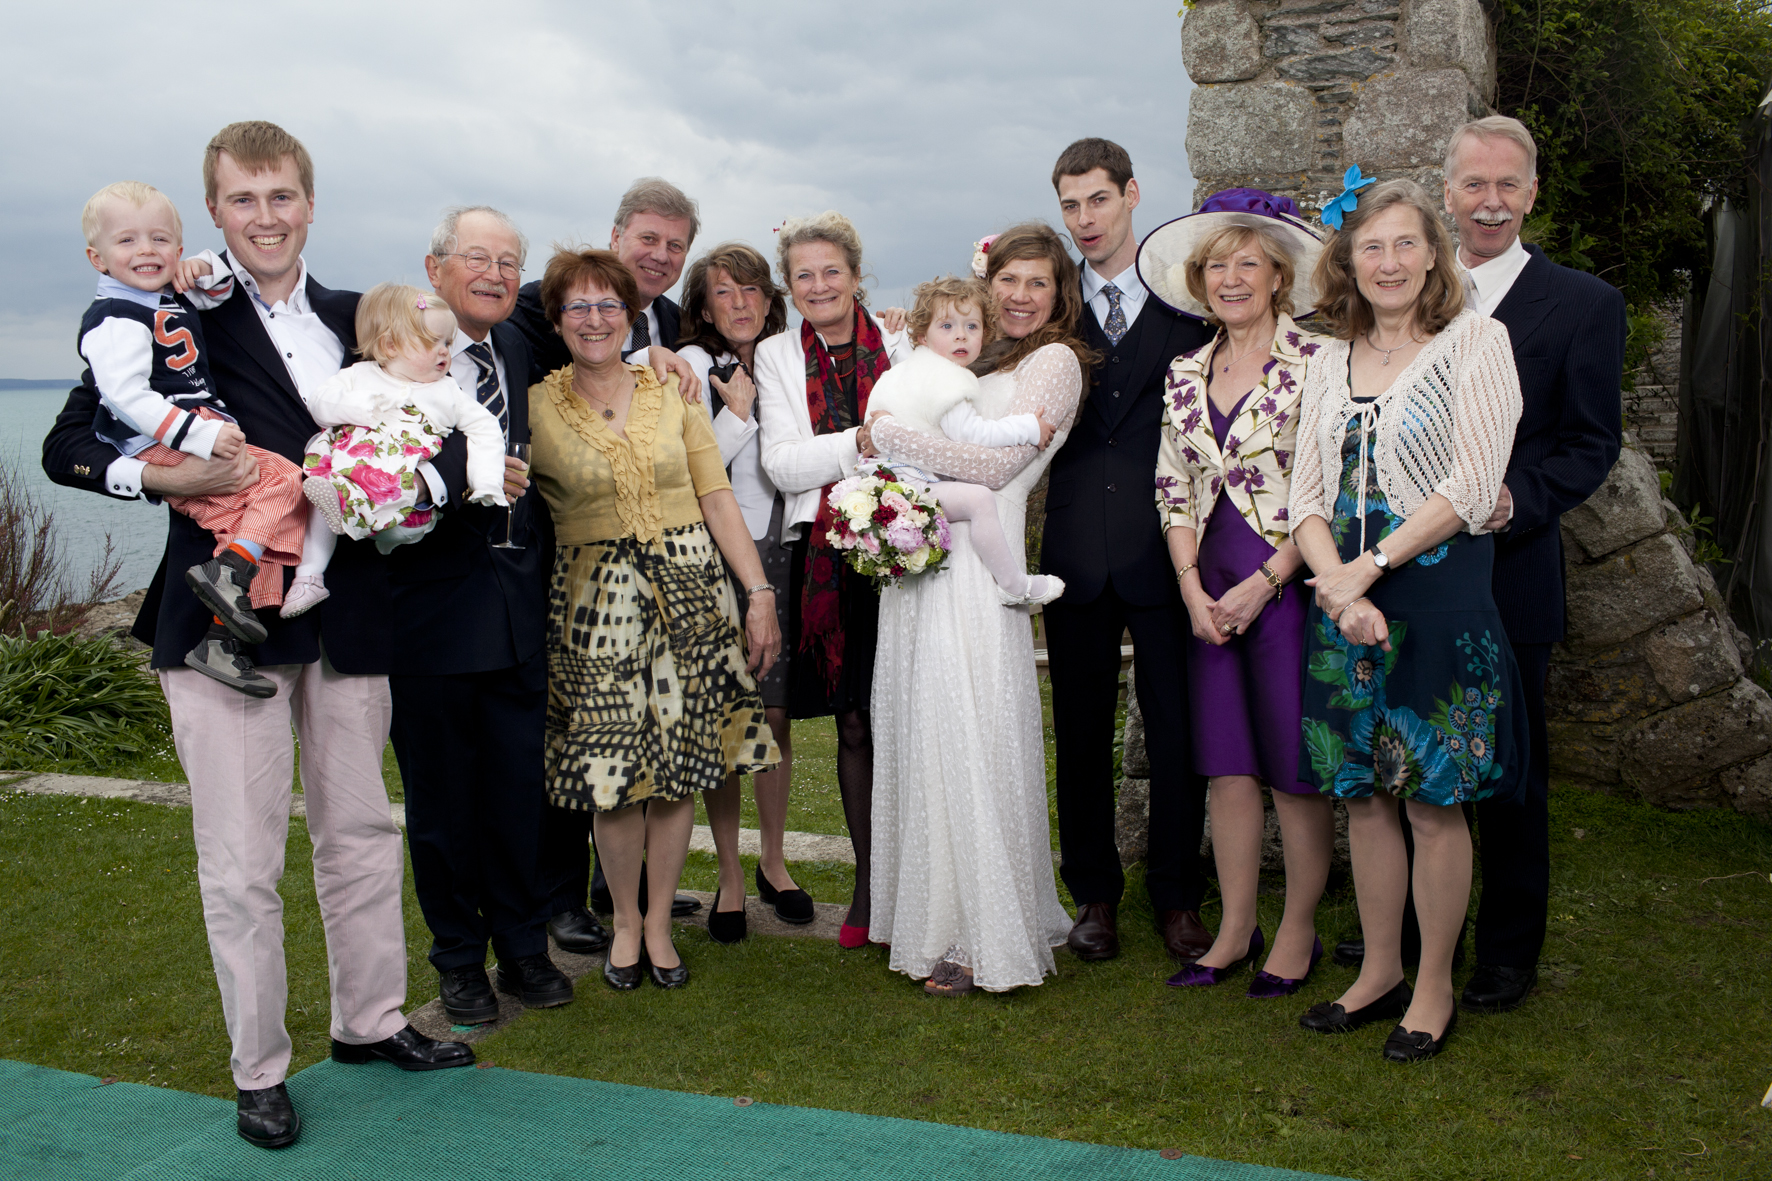 Wedding example_M&P__MG_3751_Claudia Leisinger.jpg